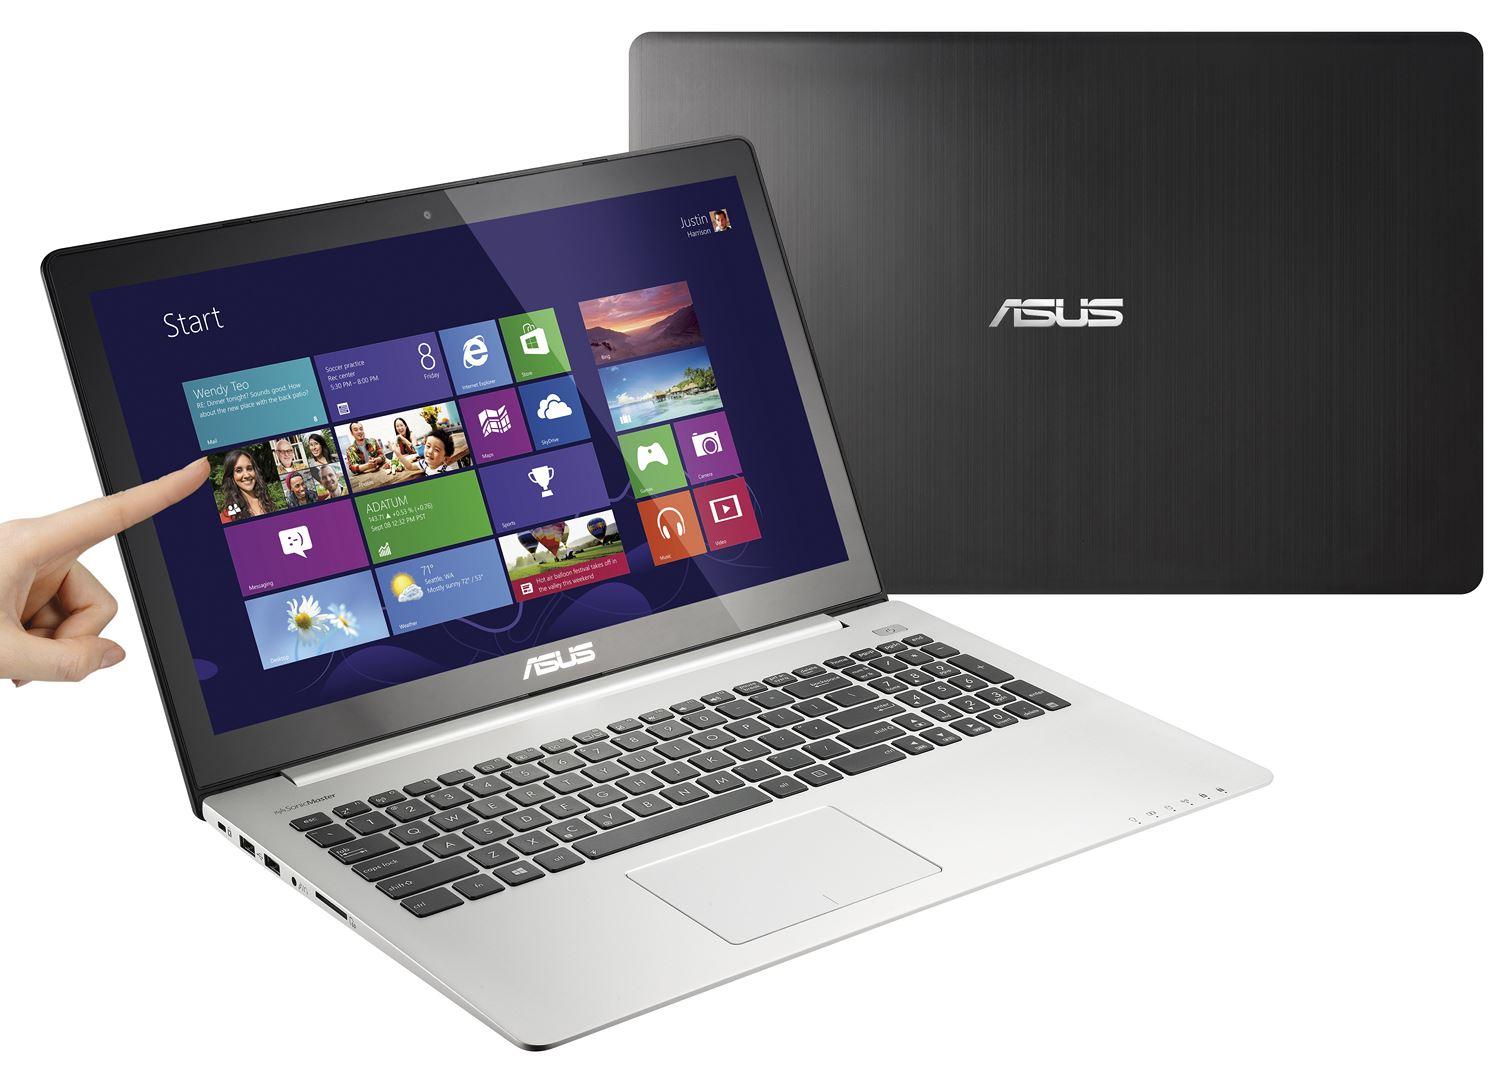 ASUS VivoBook S500 & S550 (1)